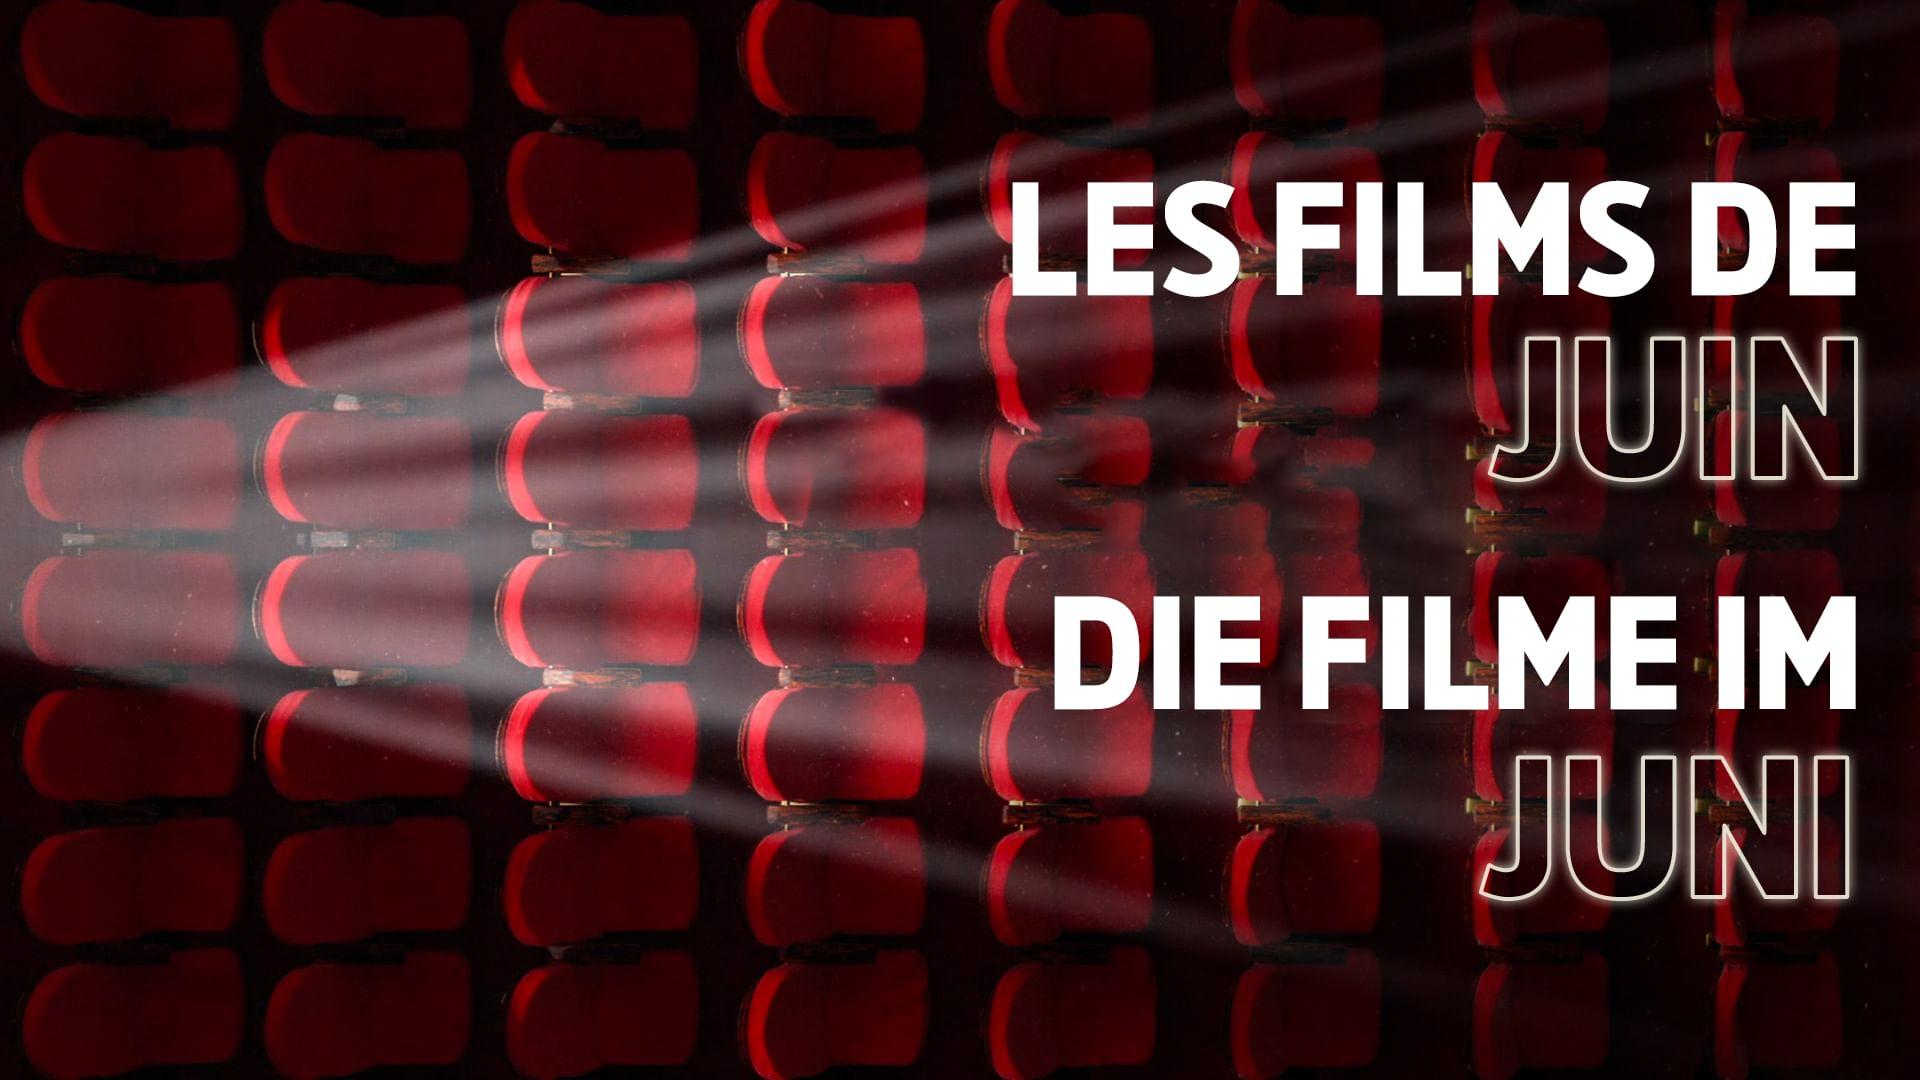 Les films de juin: aperçu en 1 minute